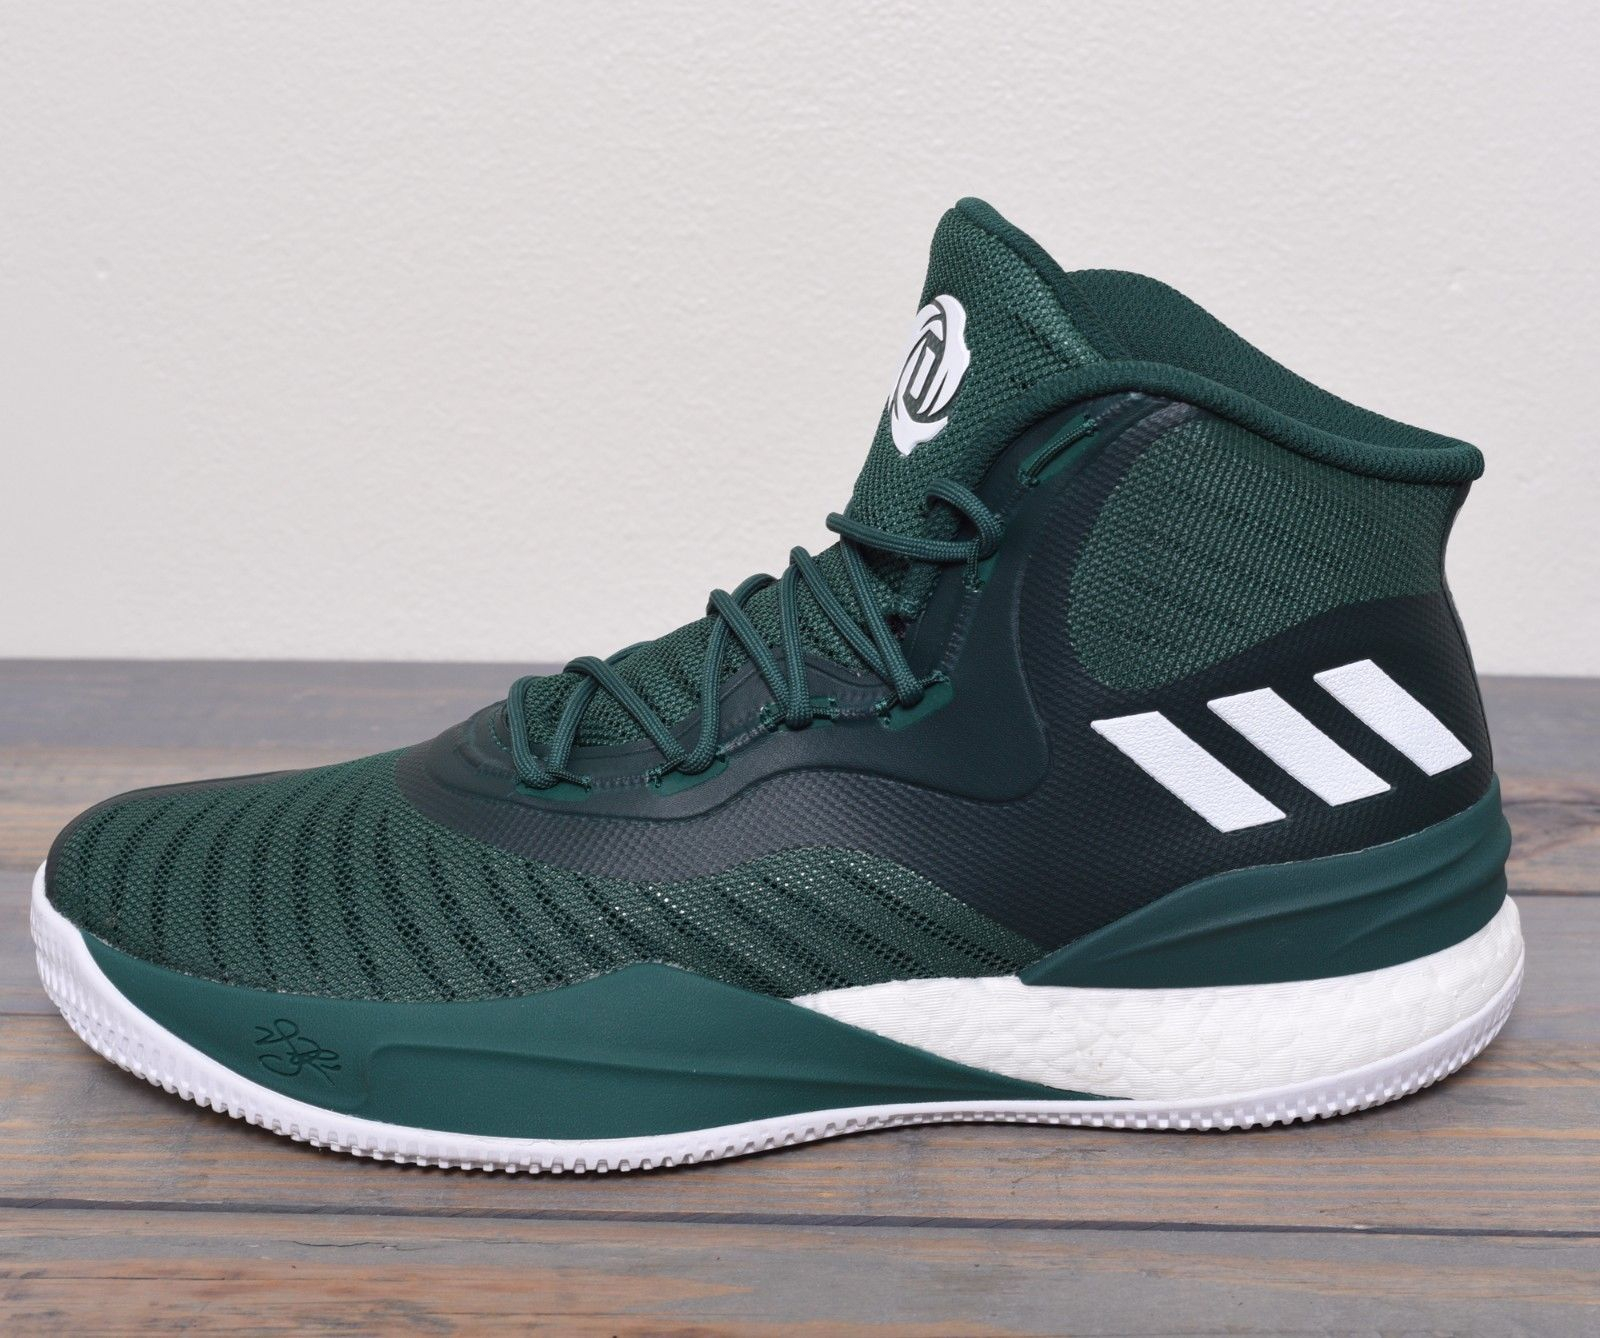 5ae10140cdf9 Adidas D Rose Basketball Shoes Men Size 12 Sneaker NBA Green White New  CQ1628